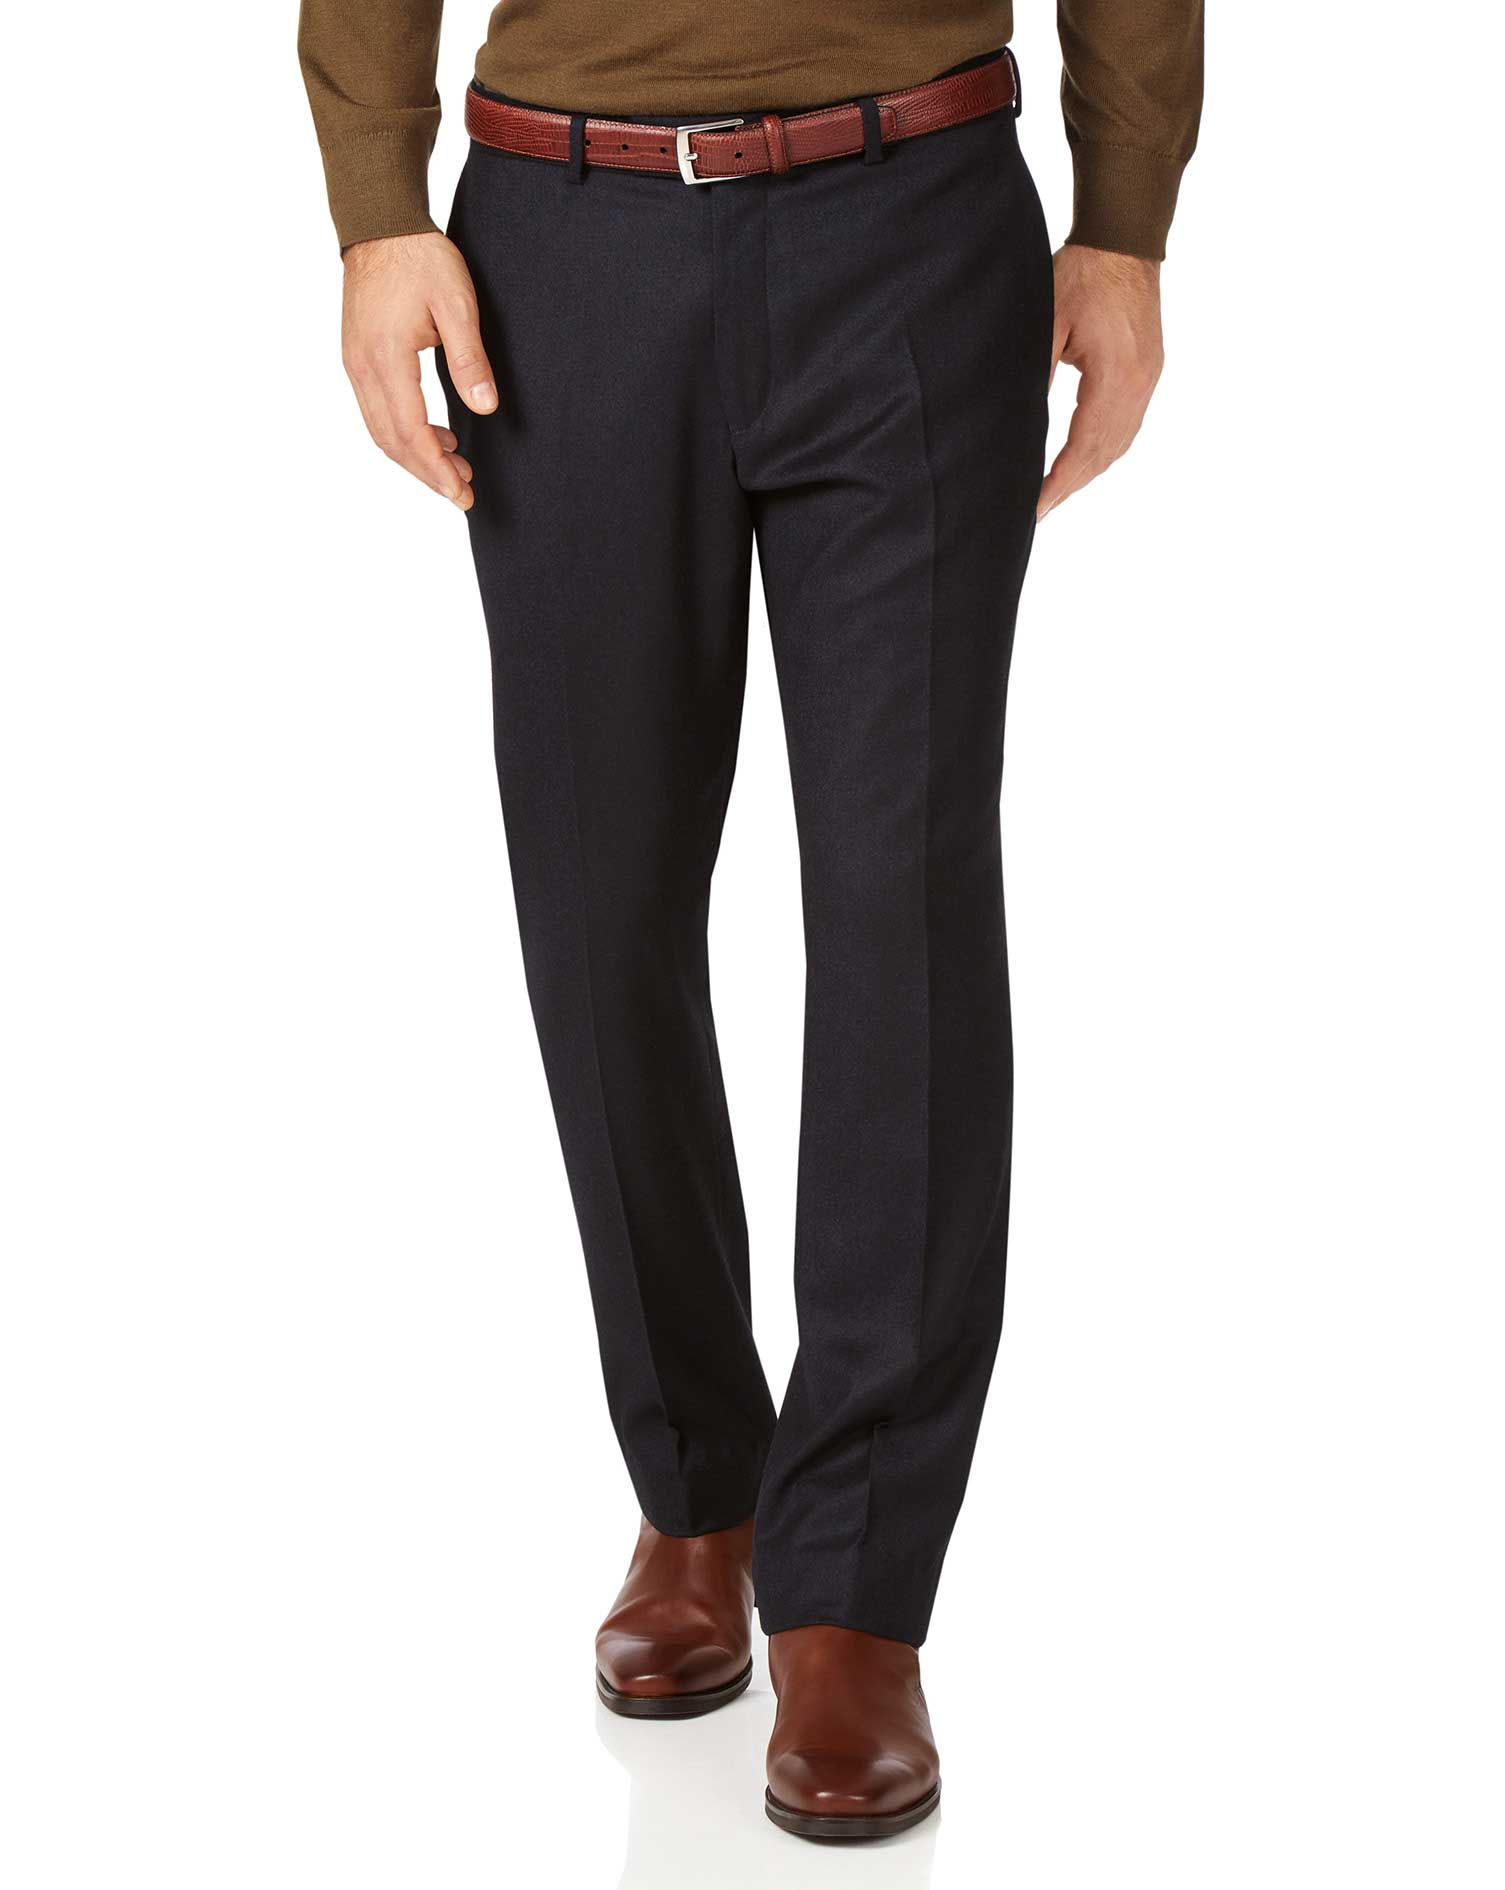 Dark Navy Slim Fit Italian Wool Flannel Trousers Size W36 L30 by Charles Tyrwhitt